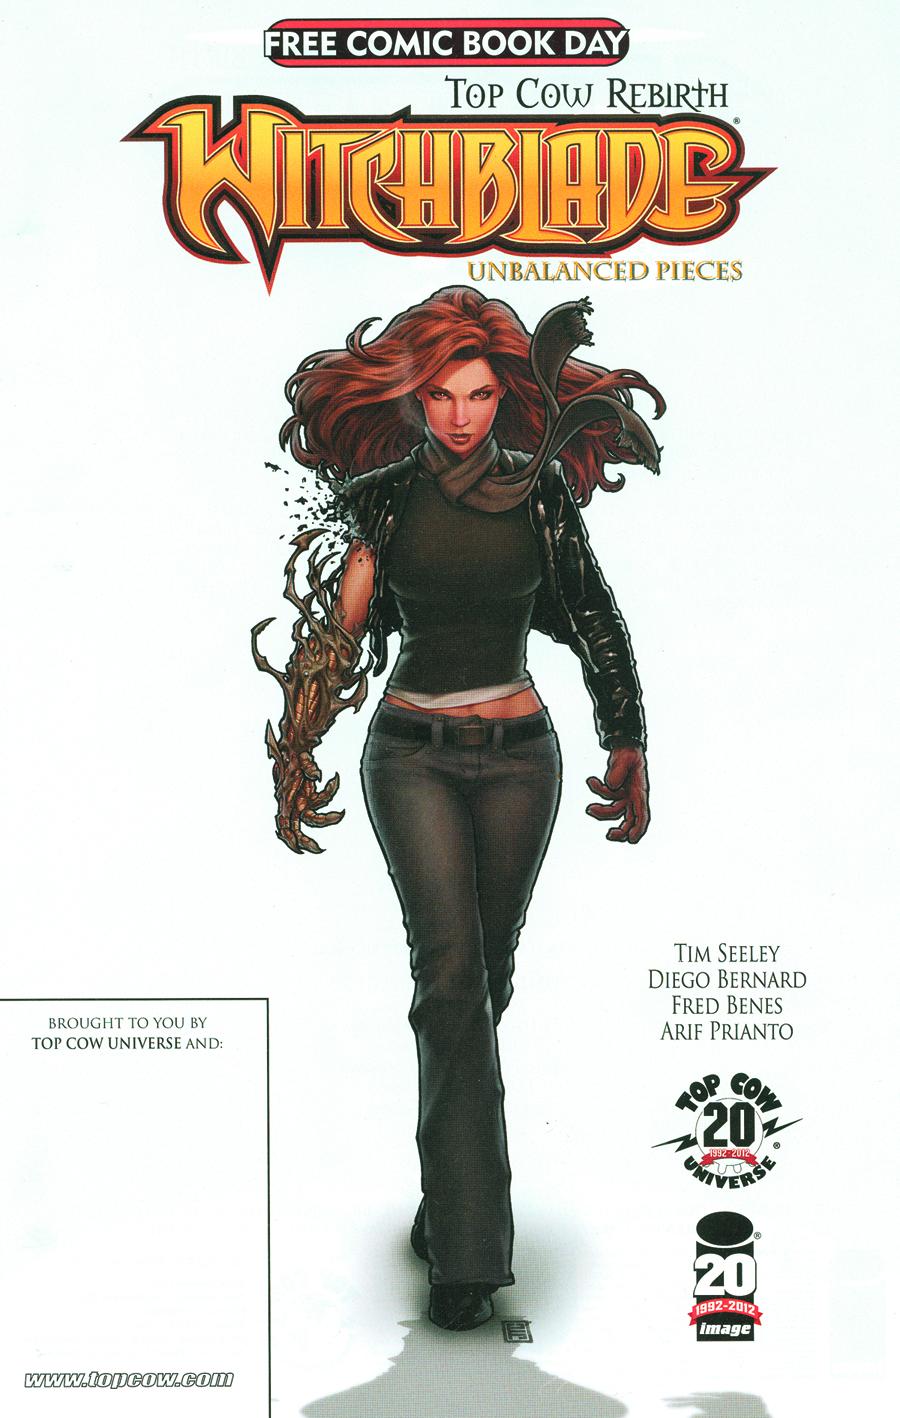 STK460688 Free Comic Book Day 2012: Reviews!